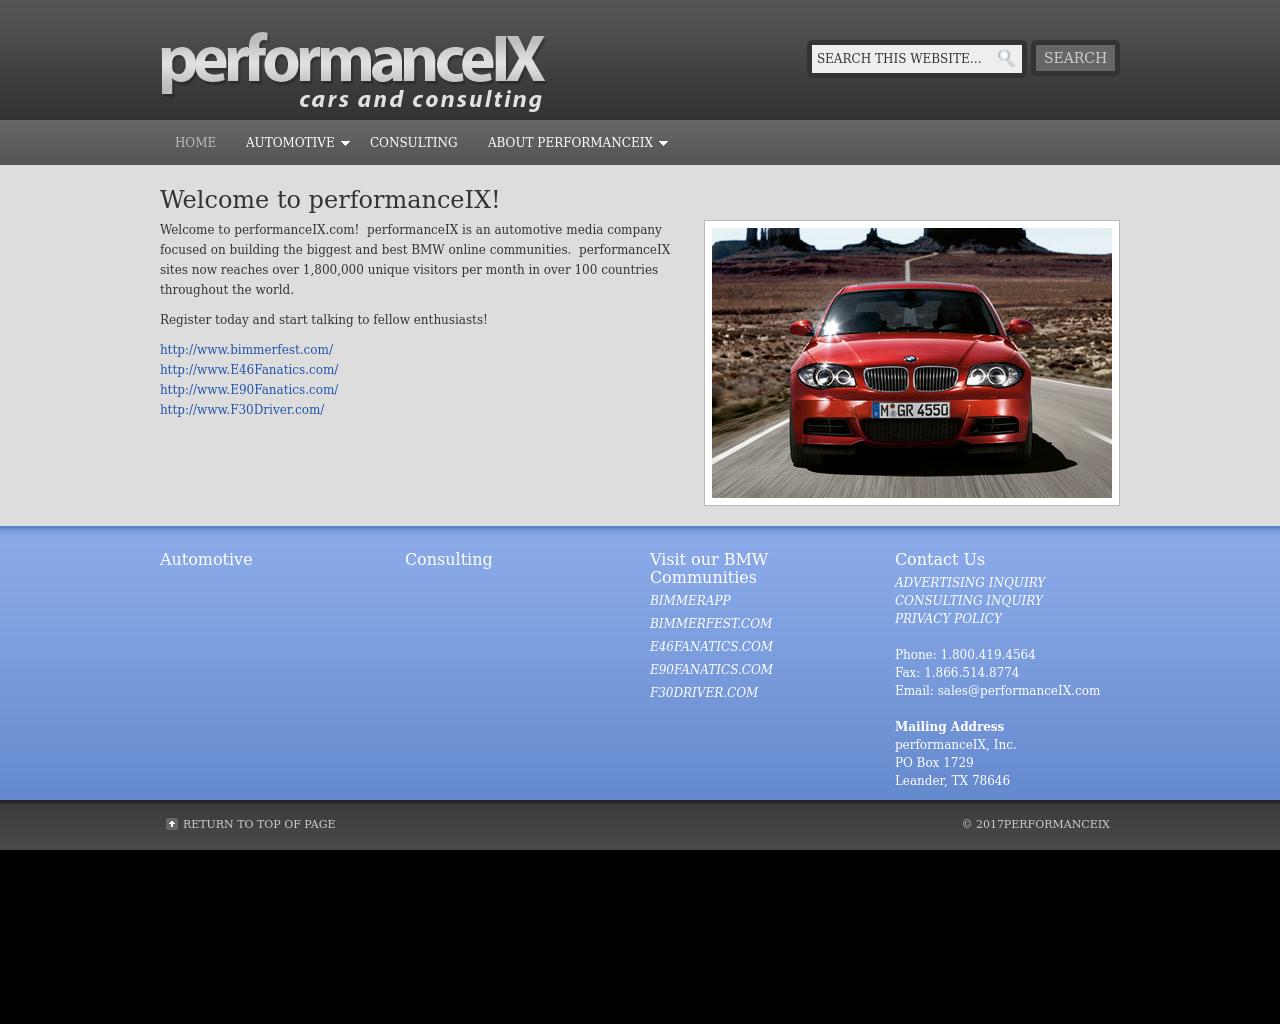 PerformanceIX-Advertising-Reviews-Pricing